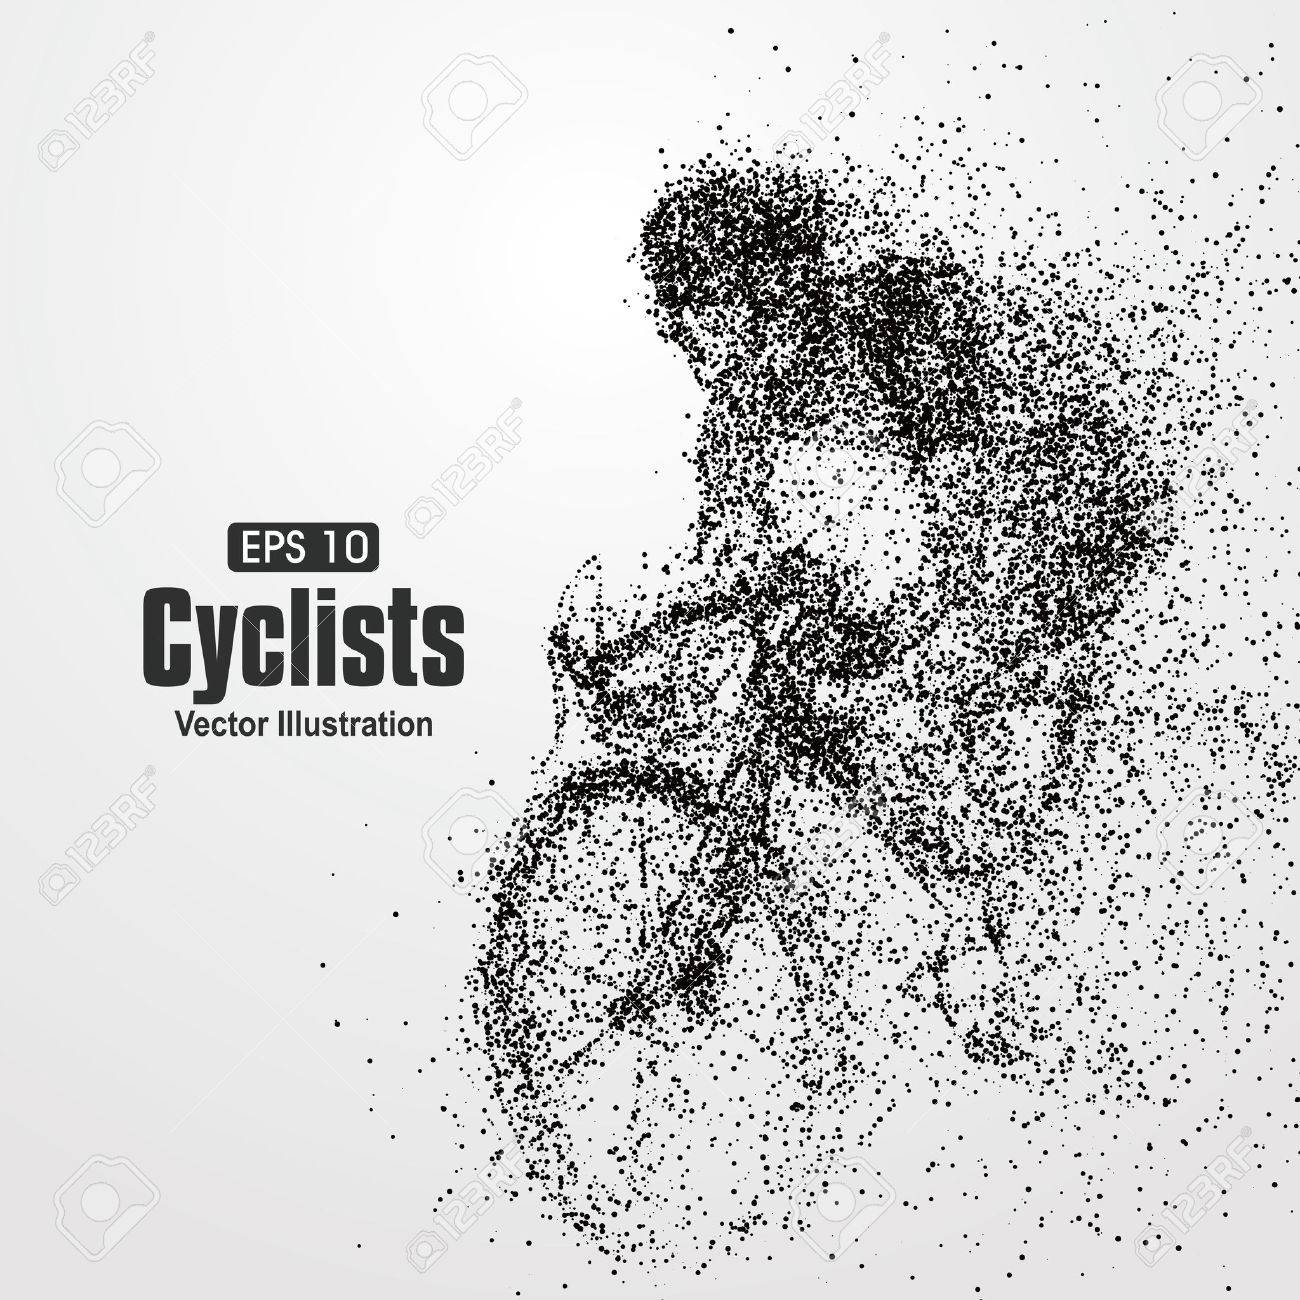 Cyclists 8e5ba63a0820d